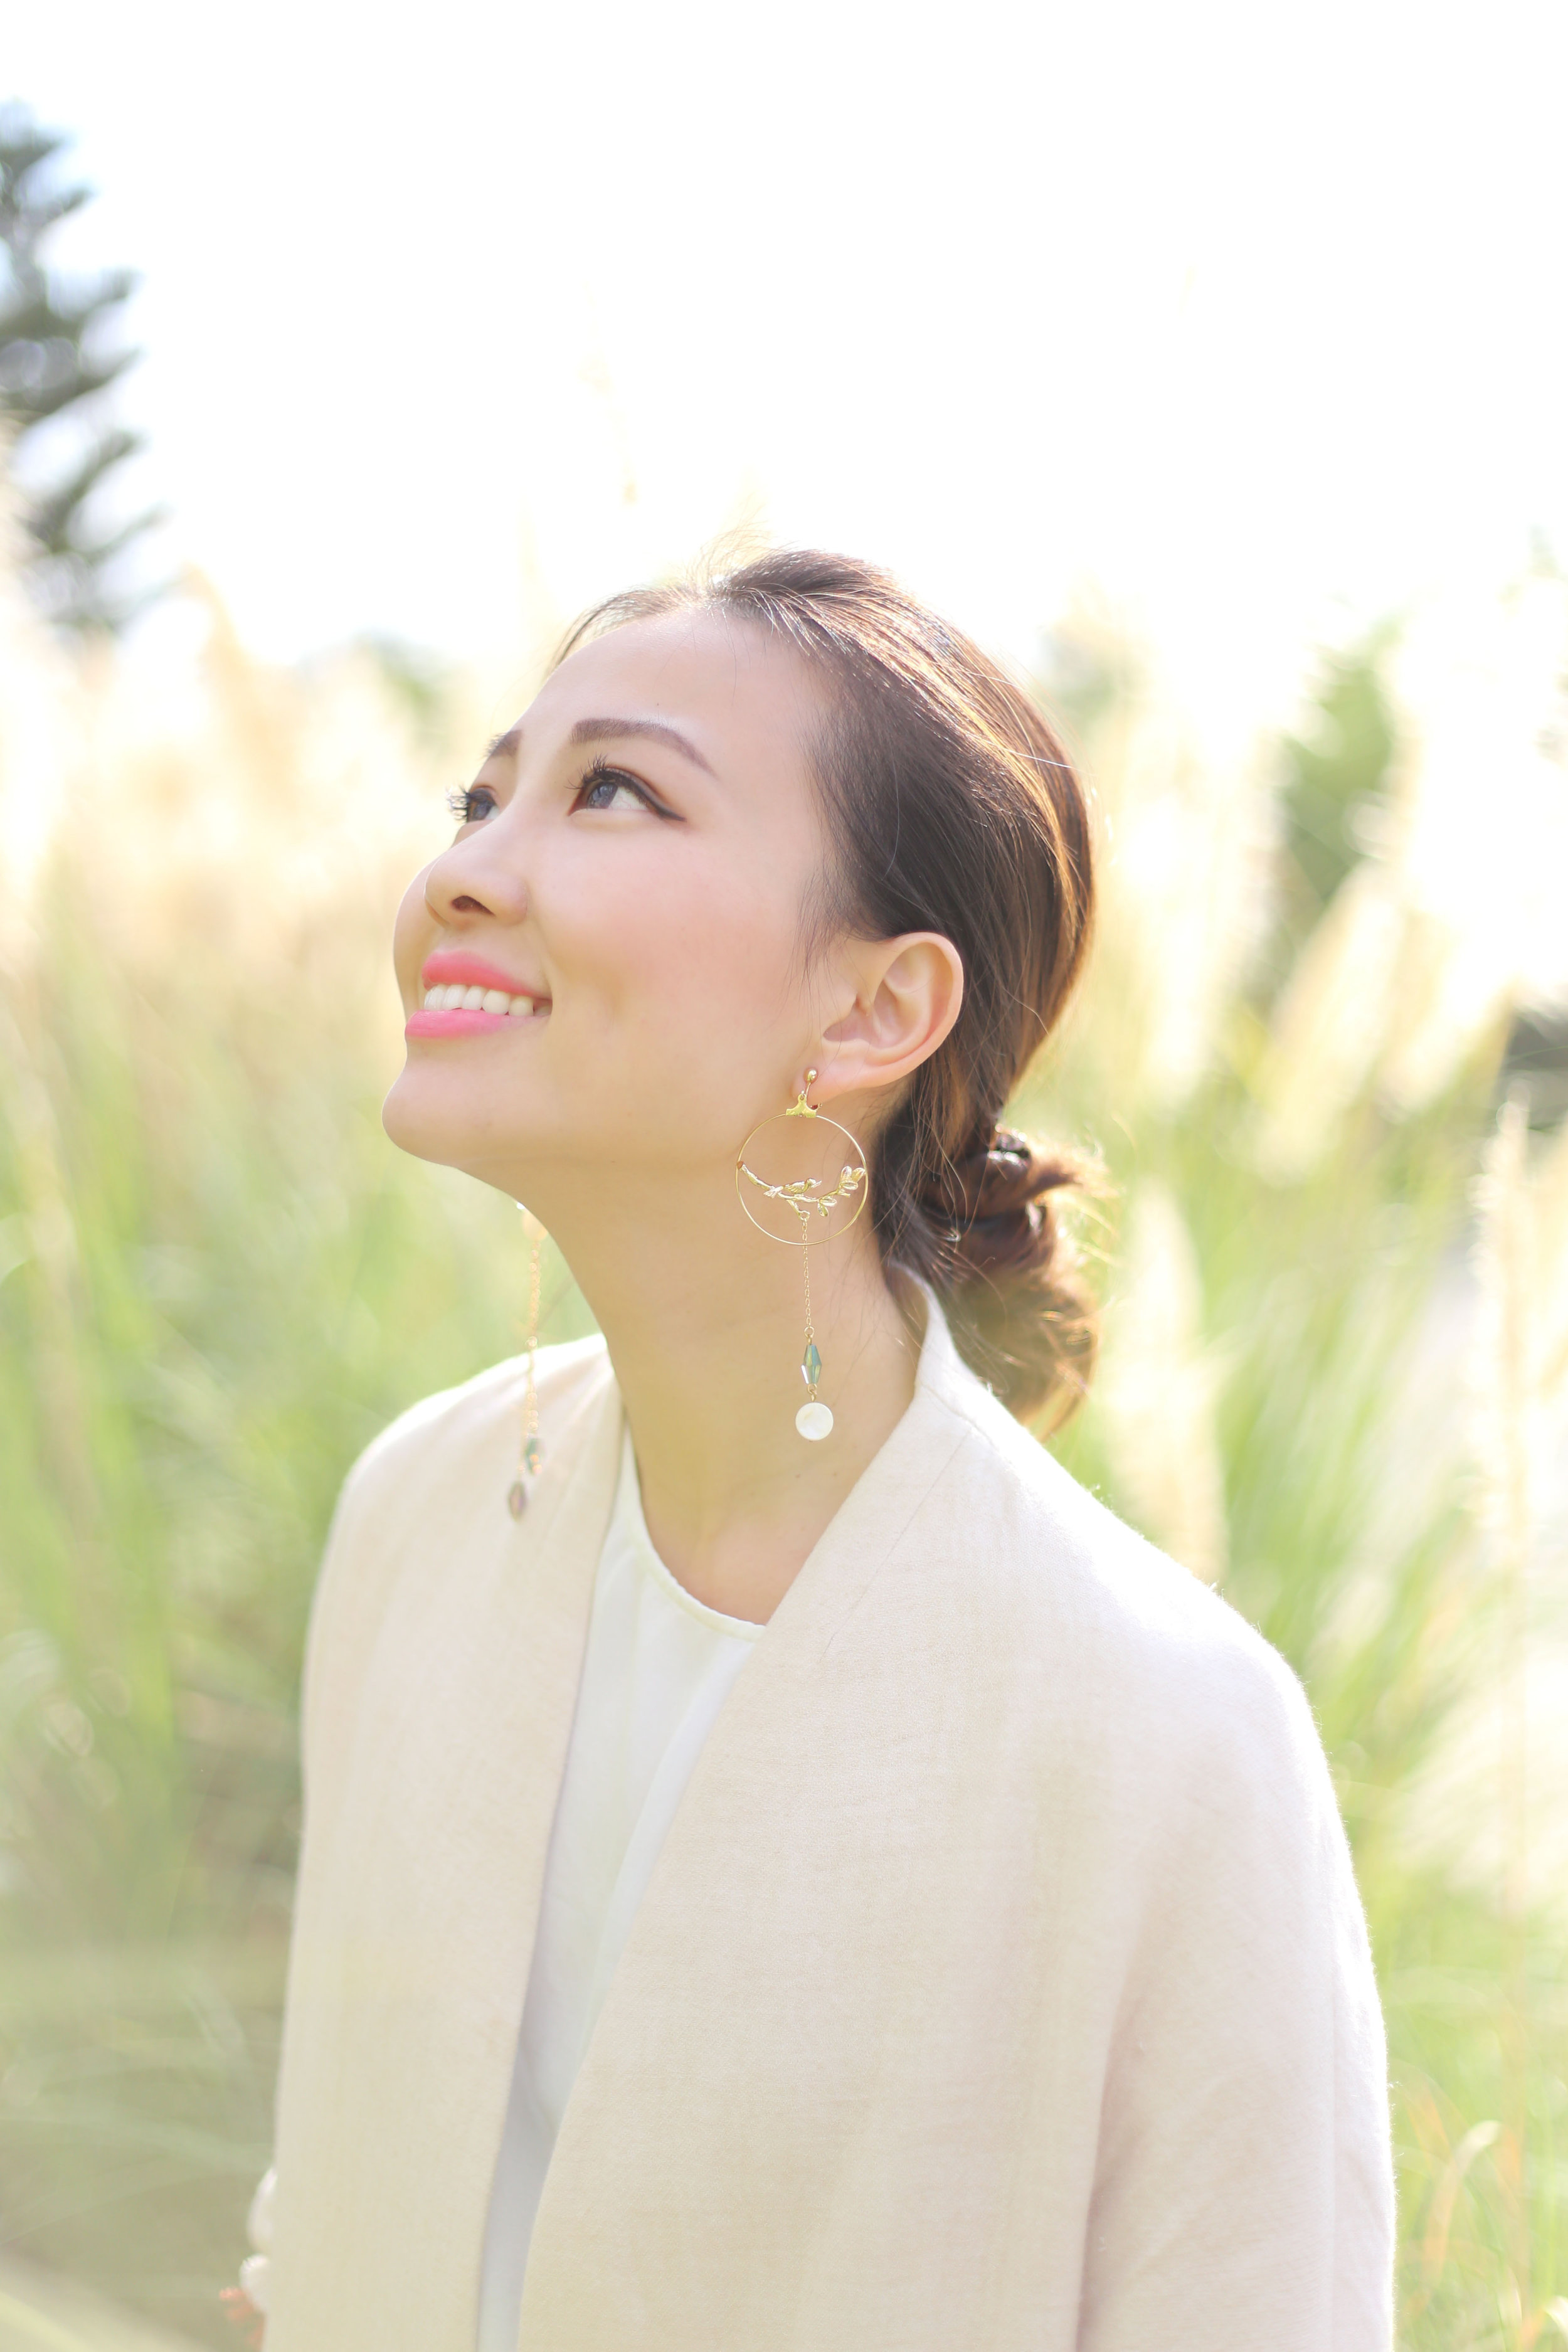 retromas statement earrings.JPG